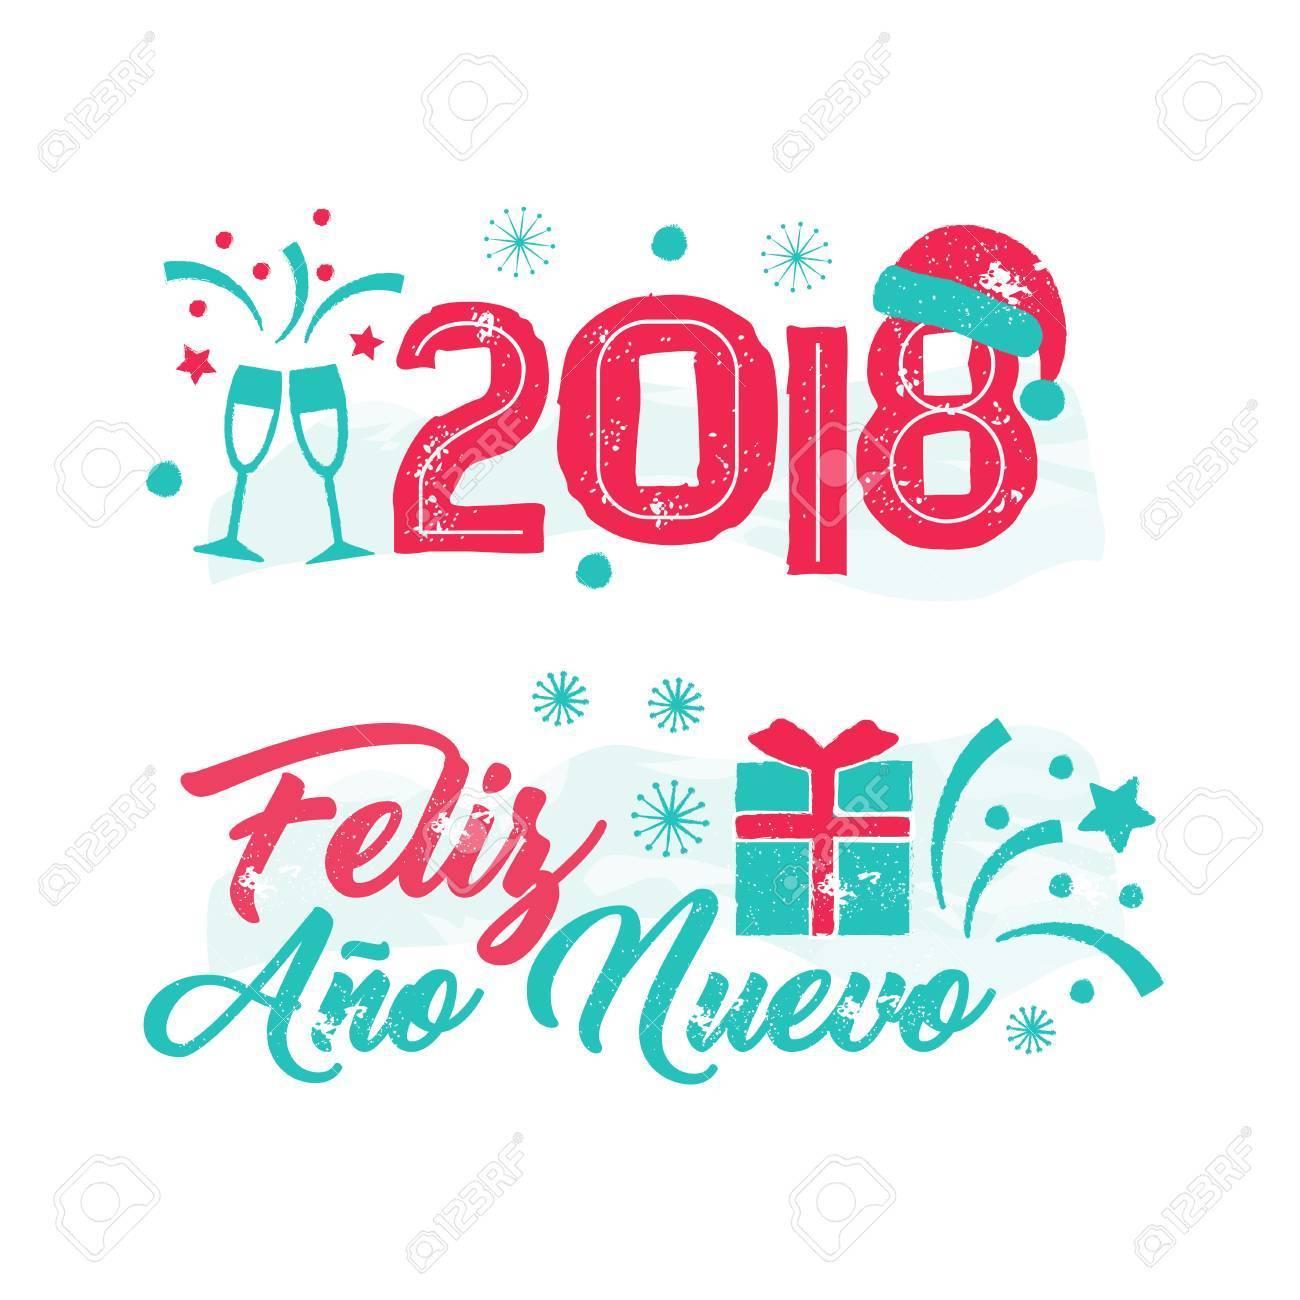 Feliz Ano Nuevo - Happy New Year Spanish Language. Royalty Free ...